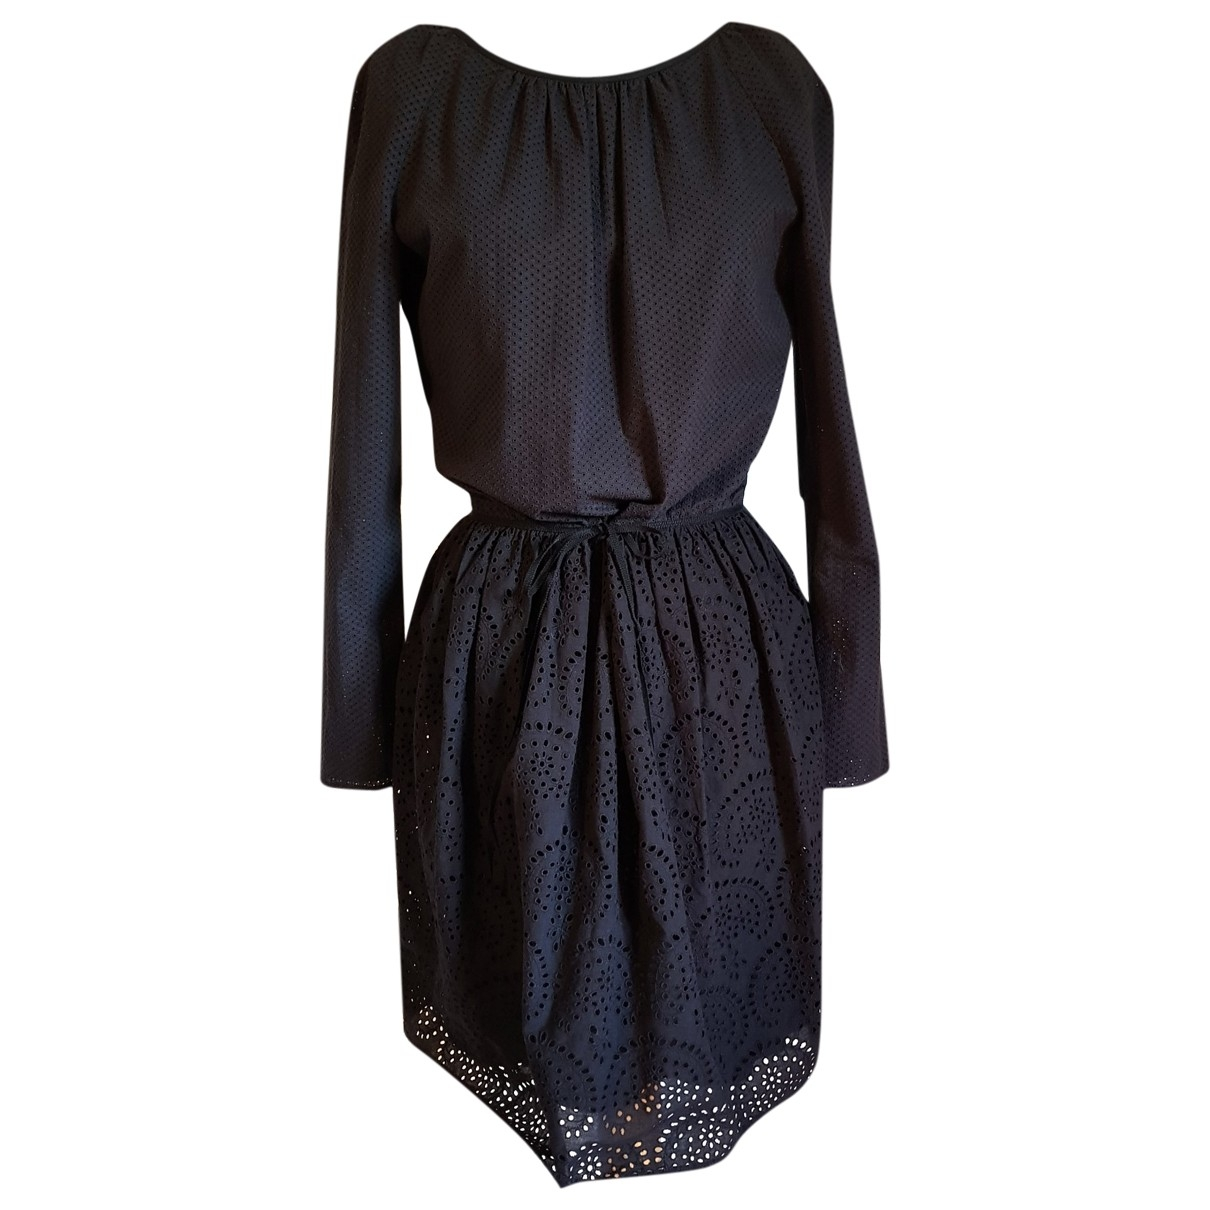 M Missoni \N Black Cotton dress for Women 36 FR